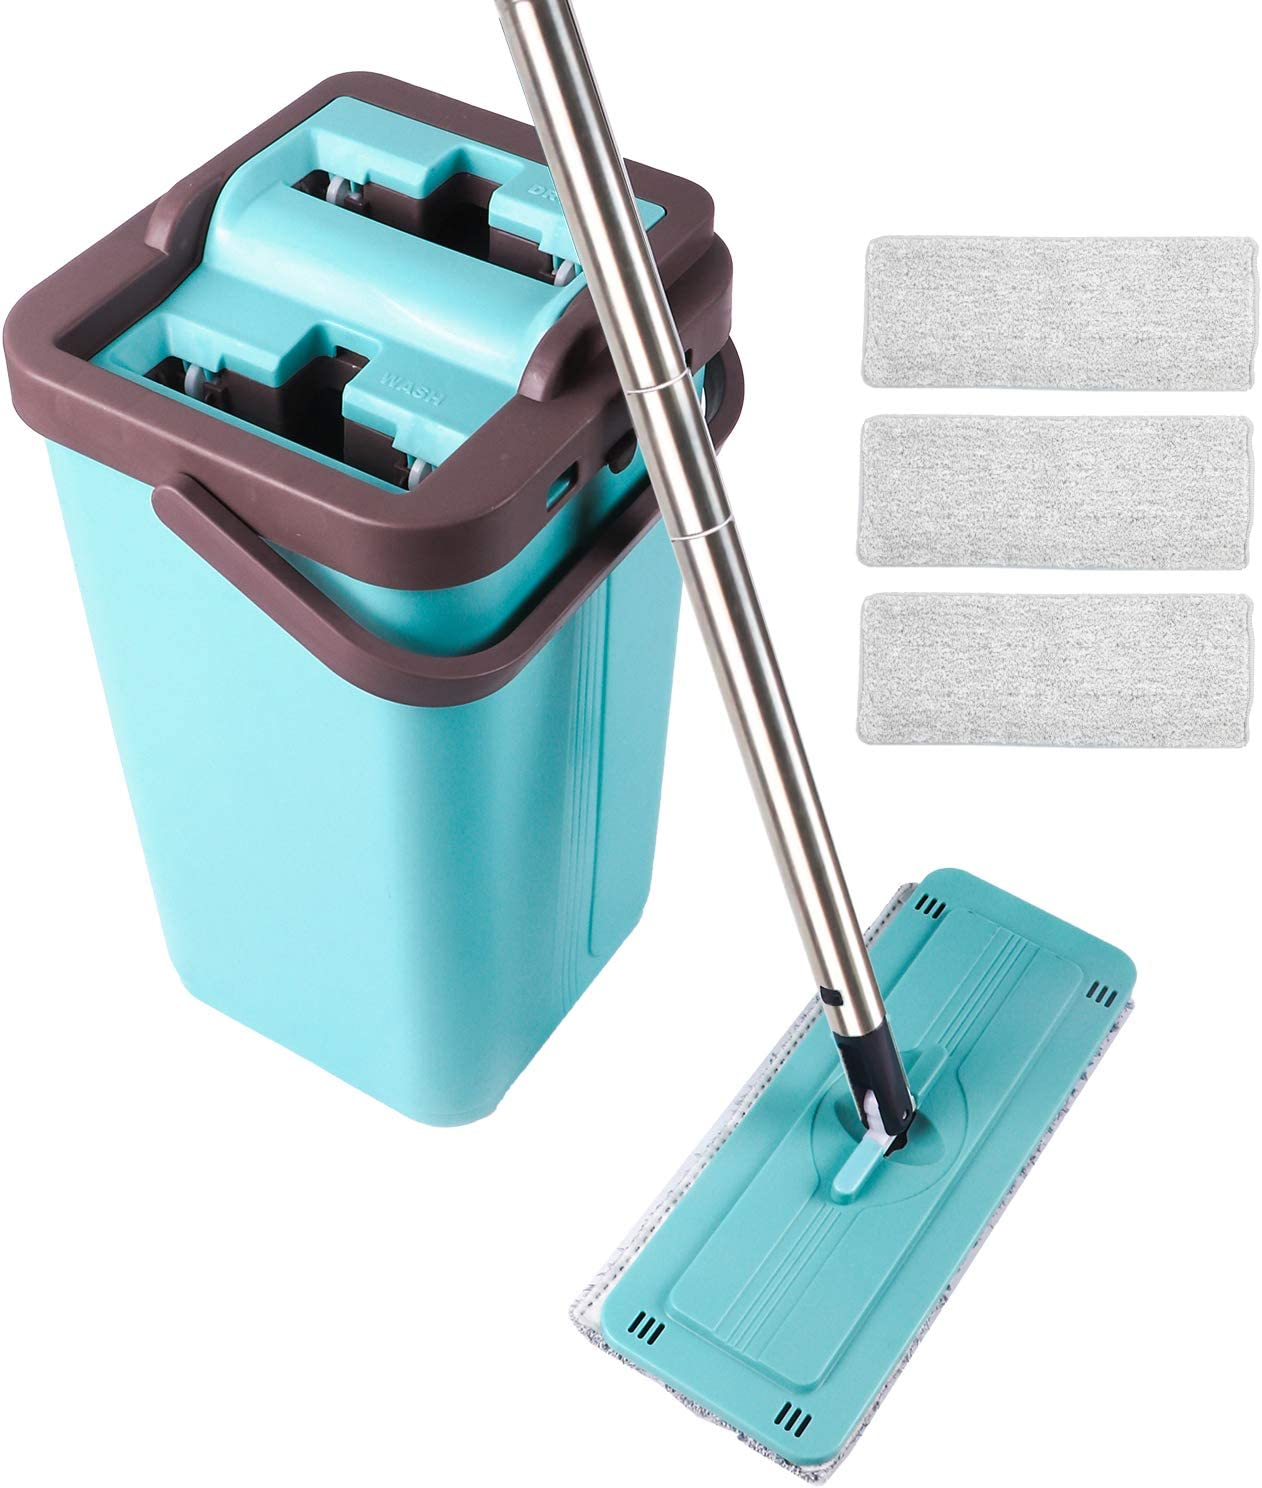 Mopas con cubo para fregar suelo de parquet